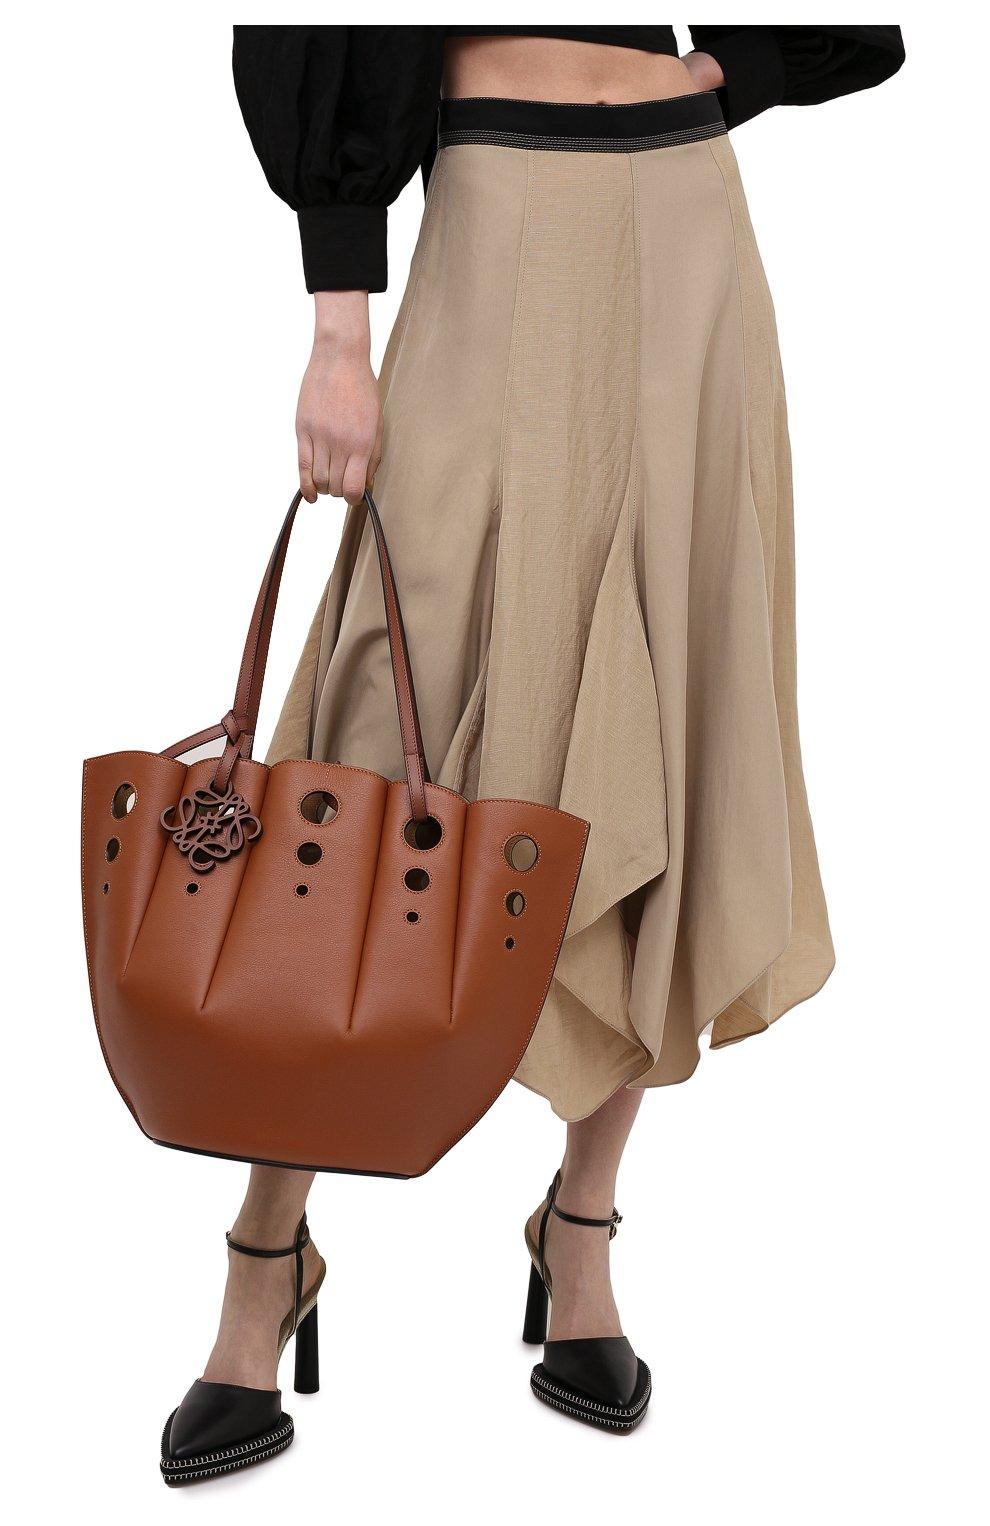 Женский сумка-тоут shell LOEWE коричневого цвета, арт. A657R52X13 | Фото 2 (Сумки-технические: Сумки-шопперы; Ошибки технического описания: Нет ширины; Размер: medium; Материал: Натуральная кожа)